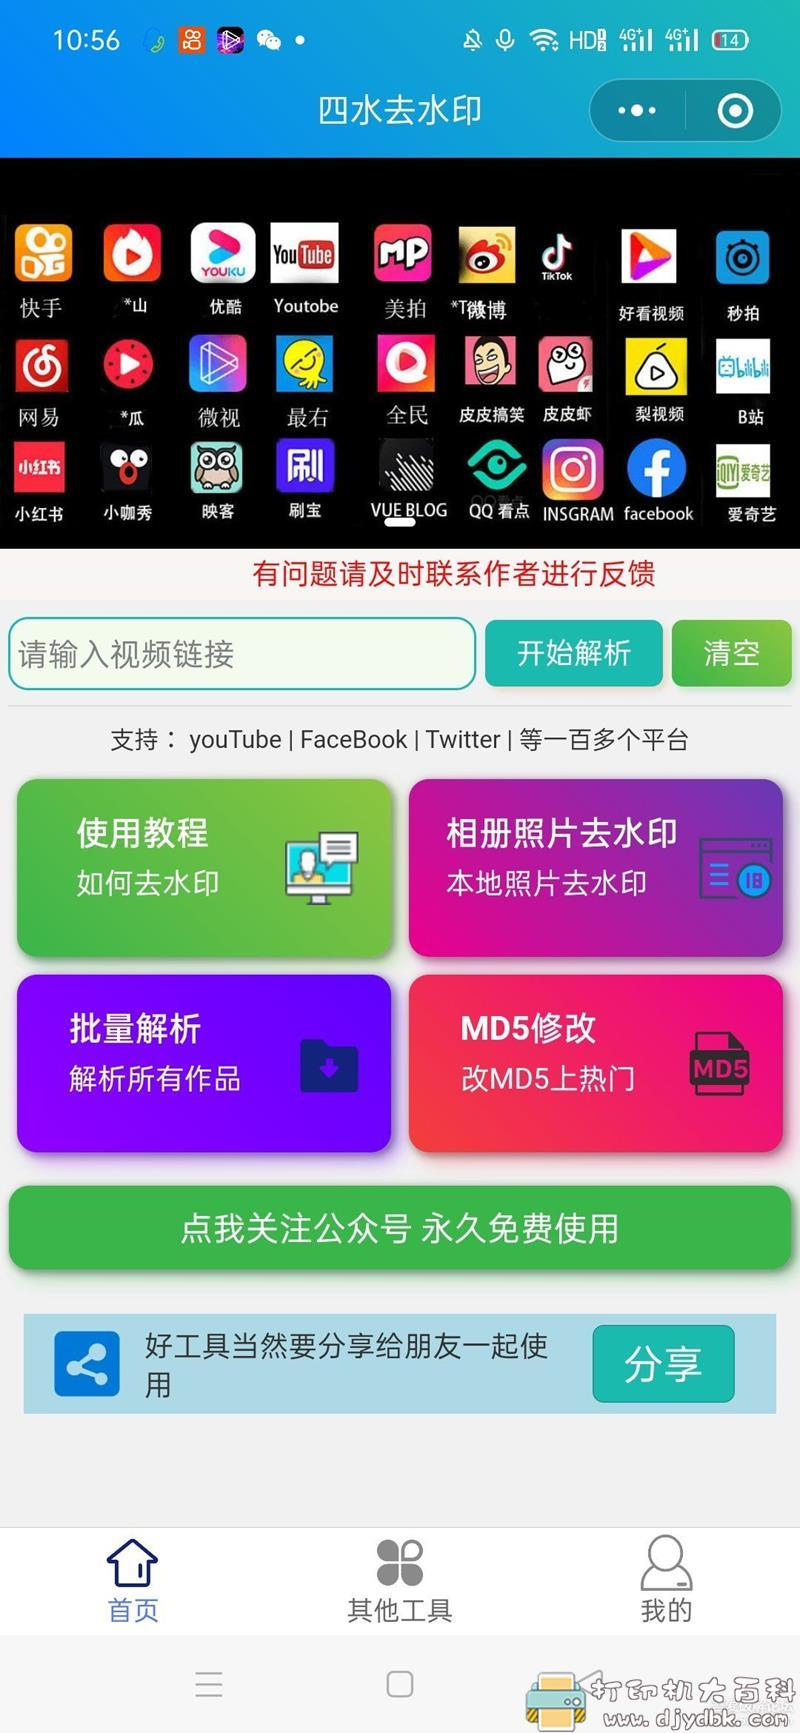 [Android]四水去水印v1.0.0,支持解析下载上百短视频平台 配图 No.1